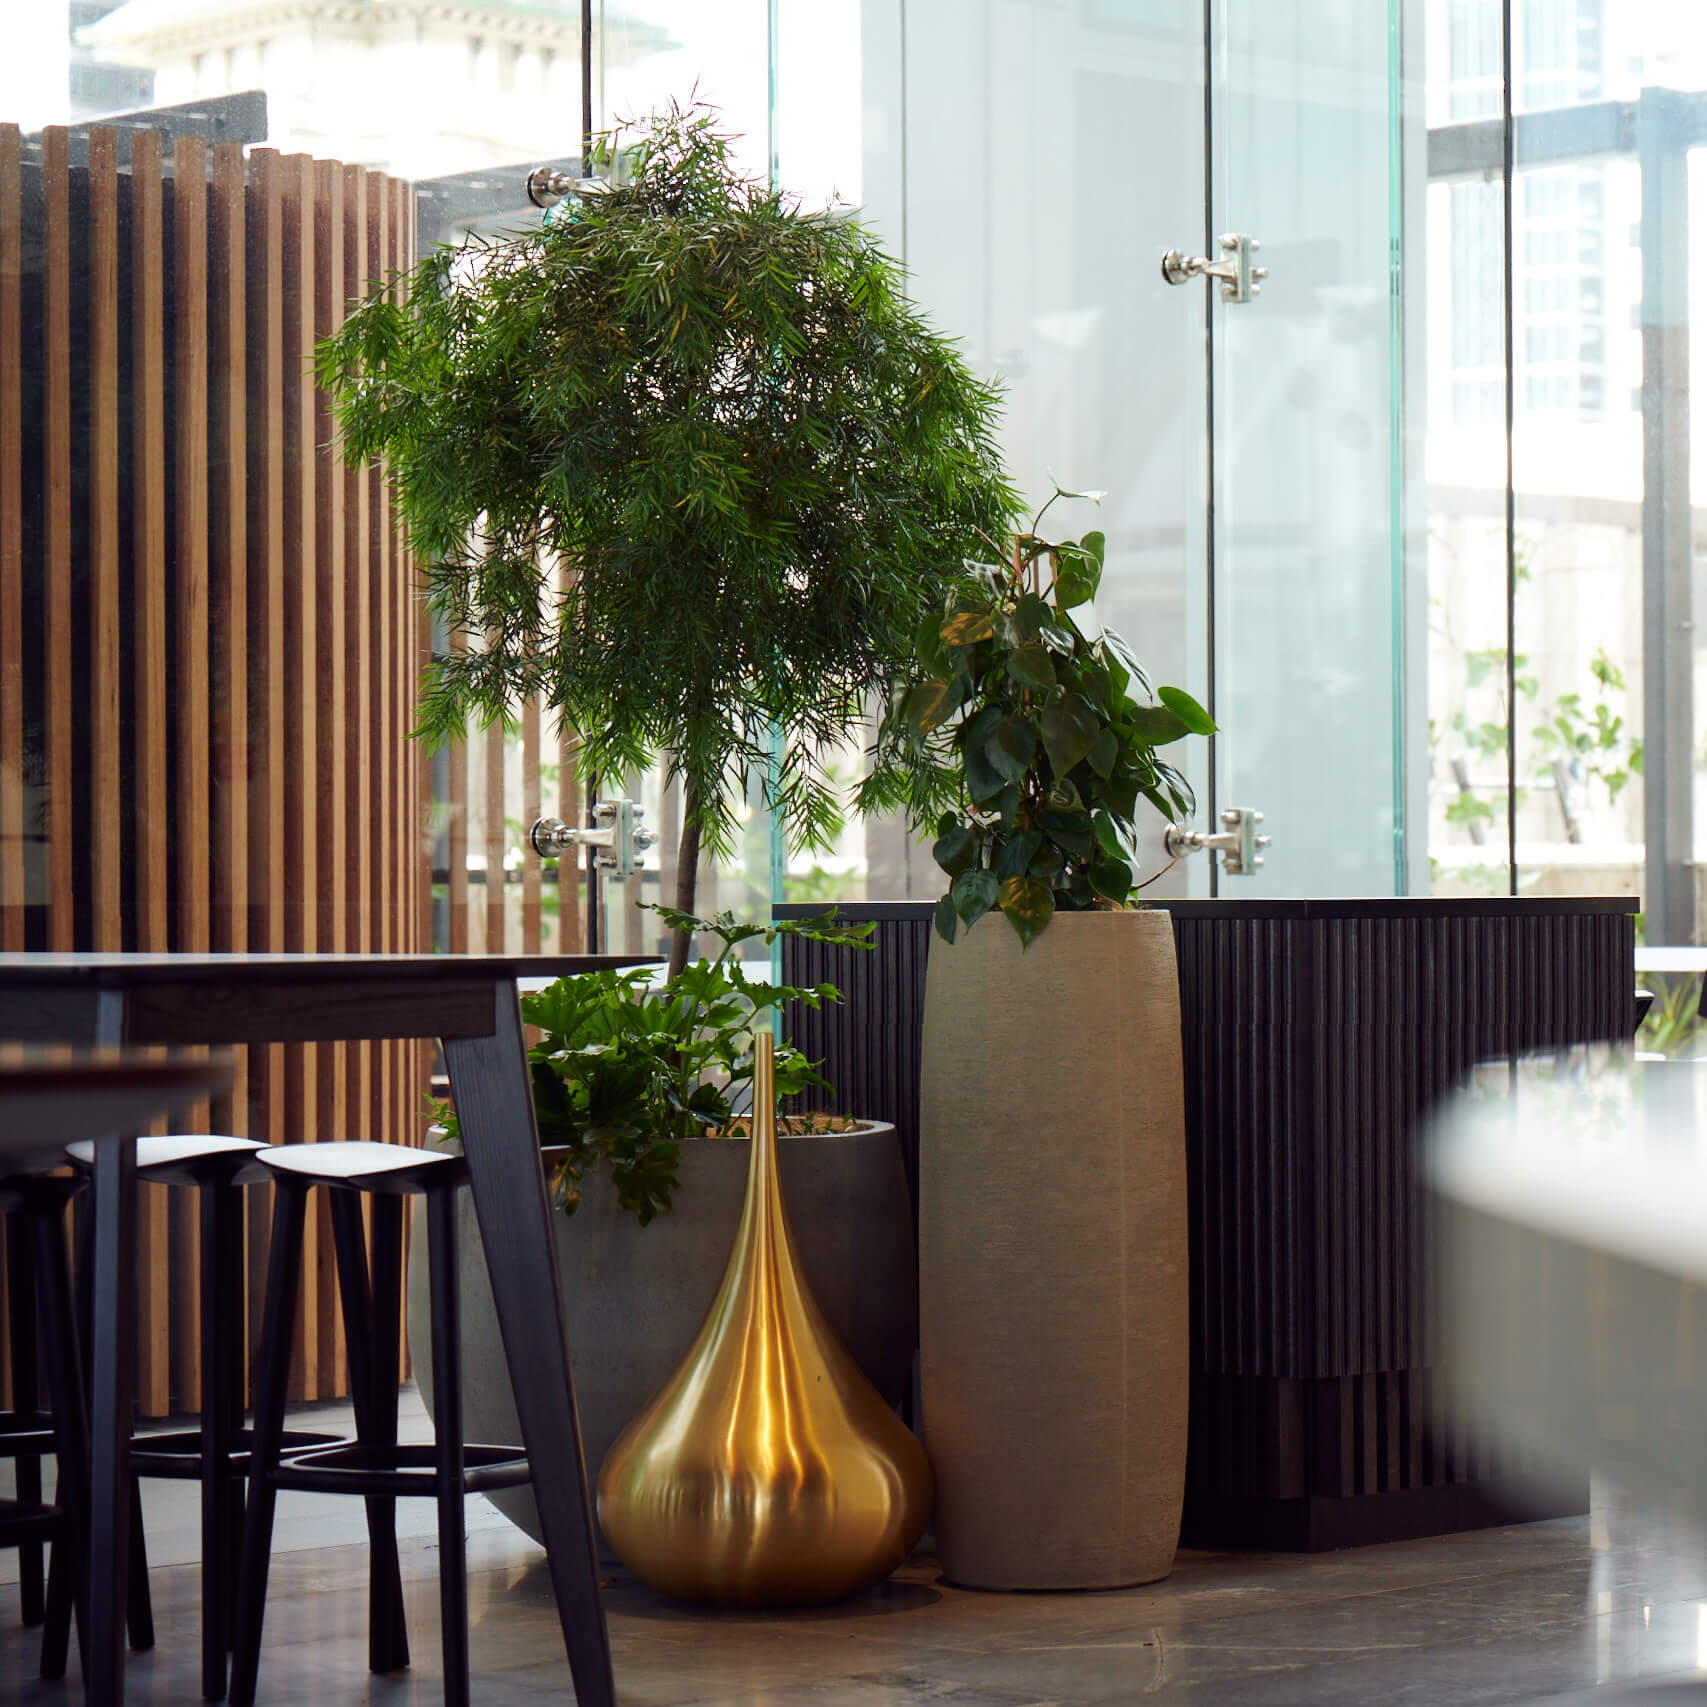 portfolio-offices-spaces-commercialbay-image5